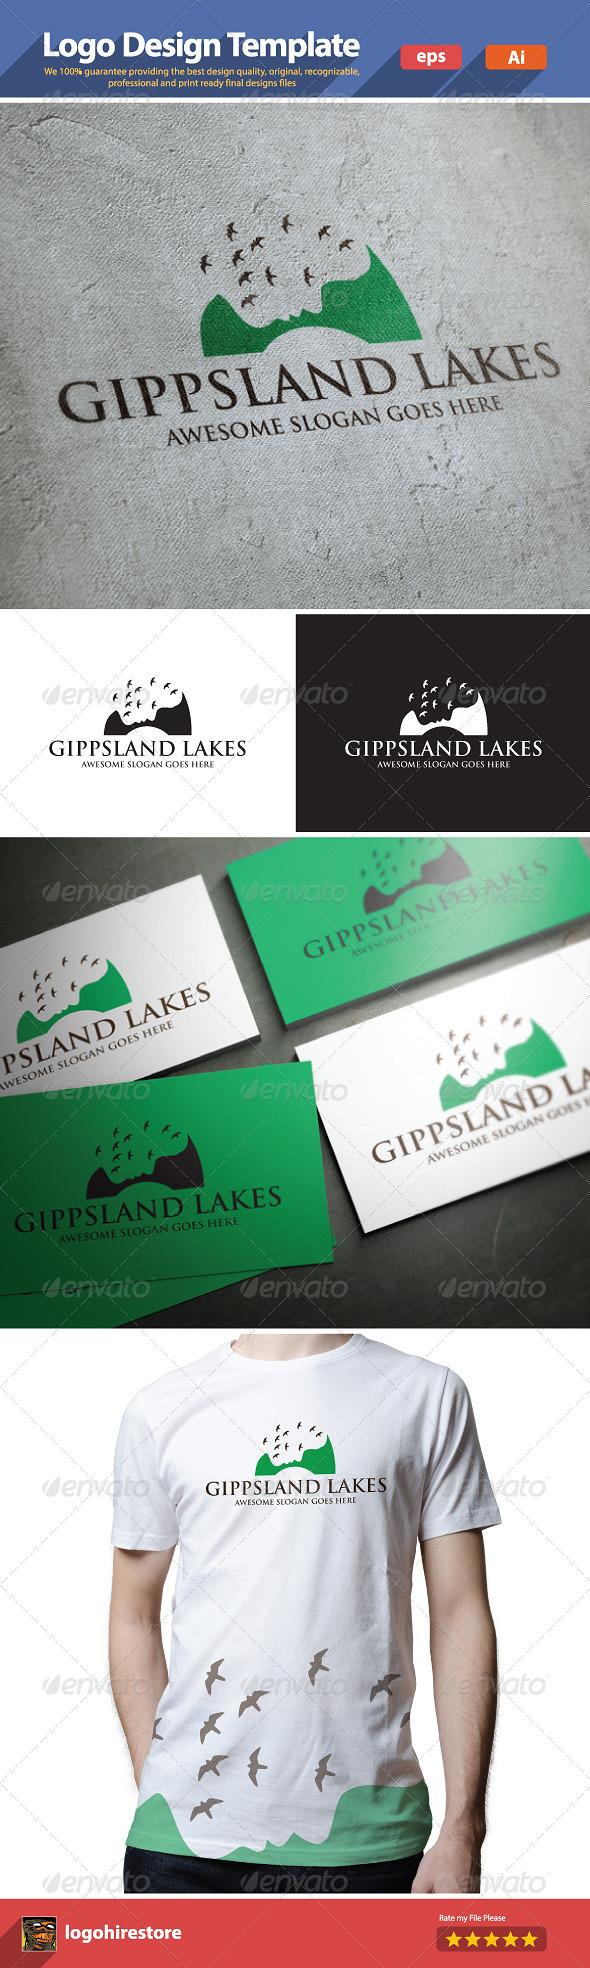 GraphicRiver Gippsland Lakes 6210816